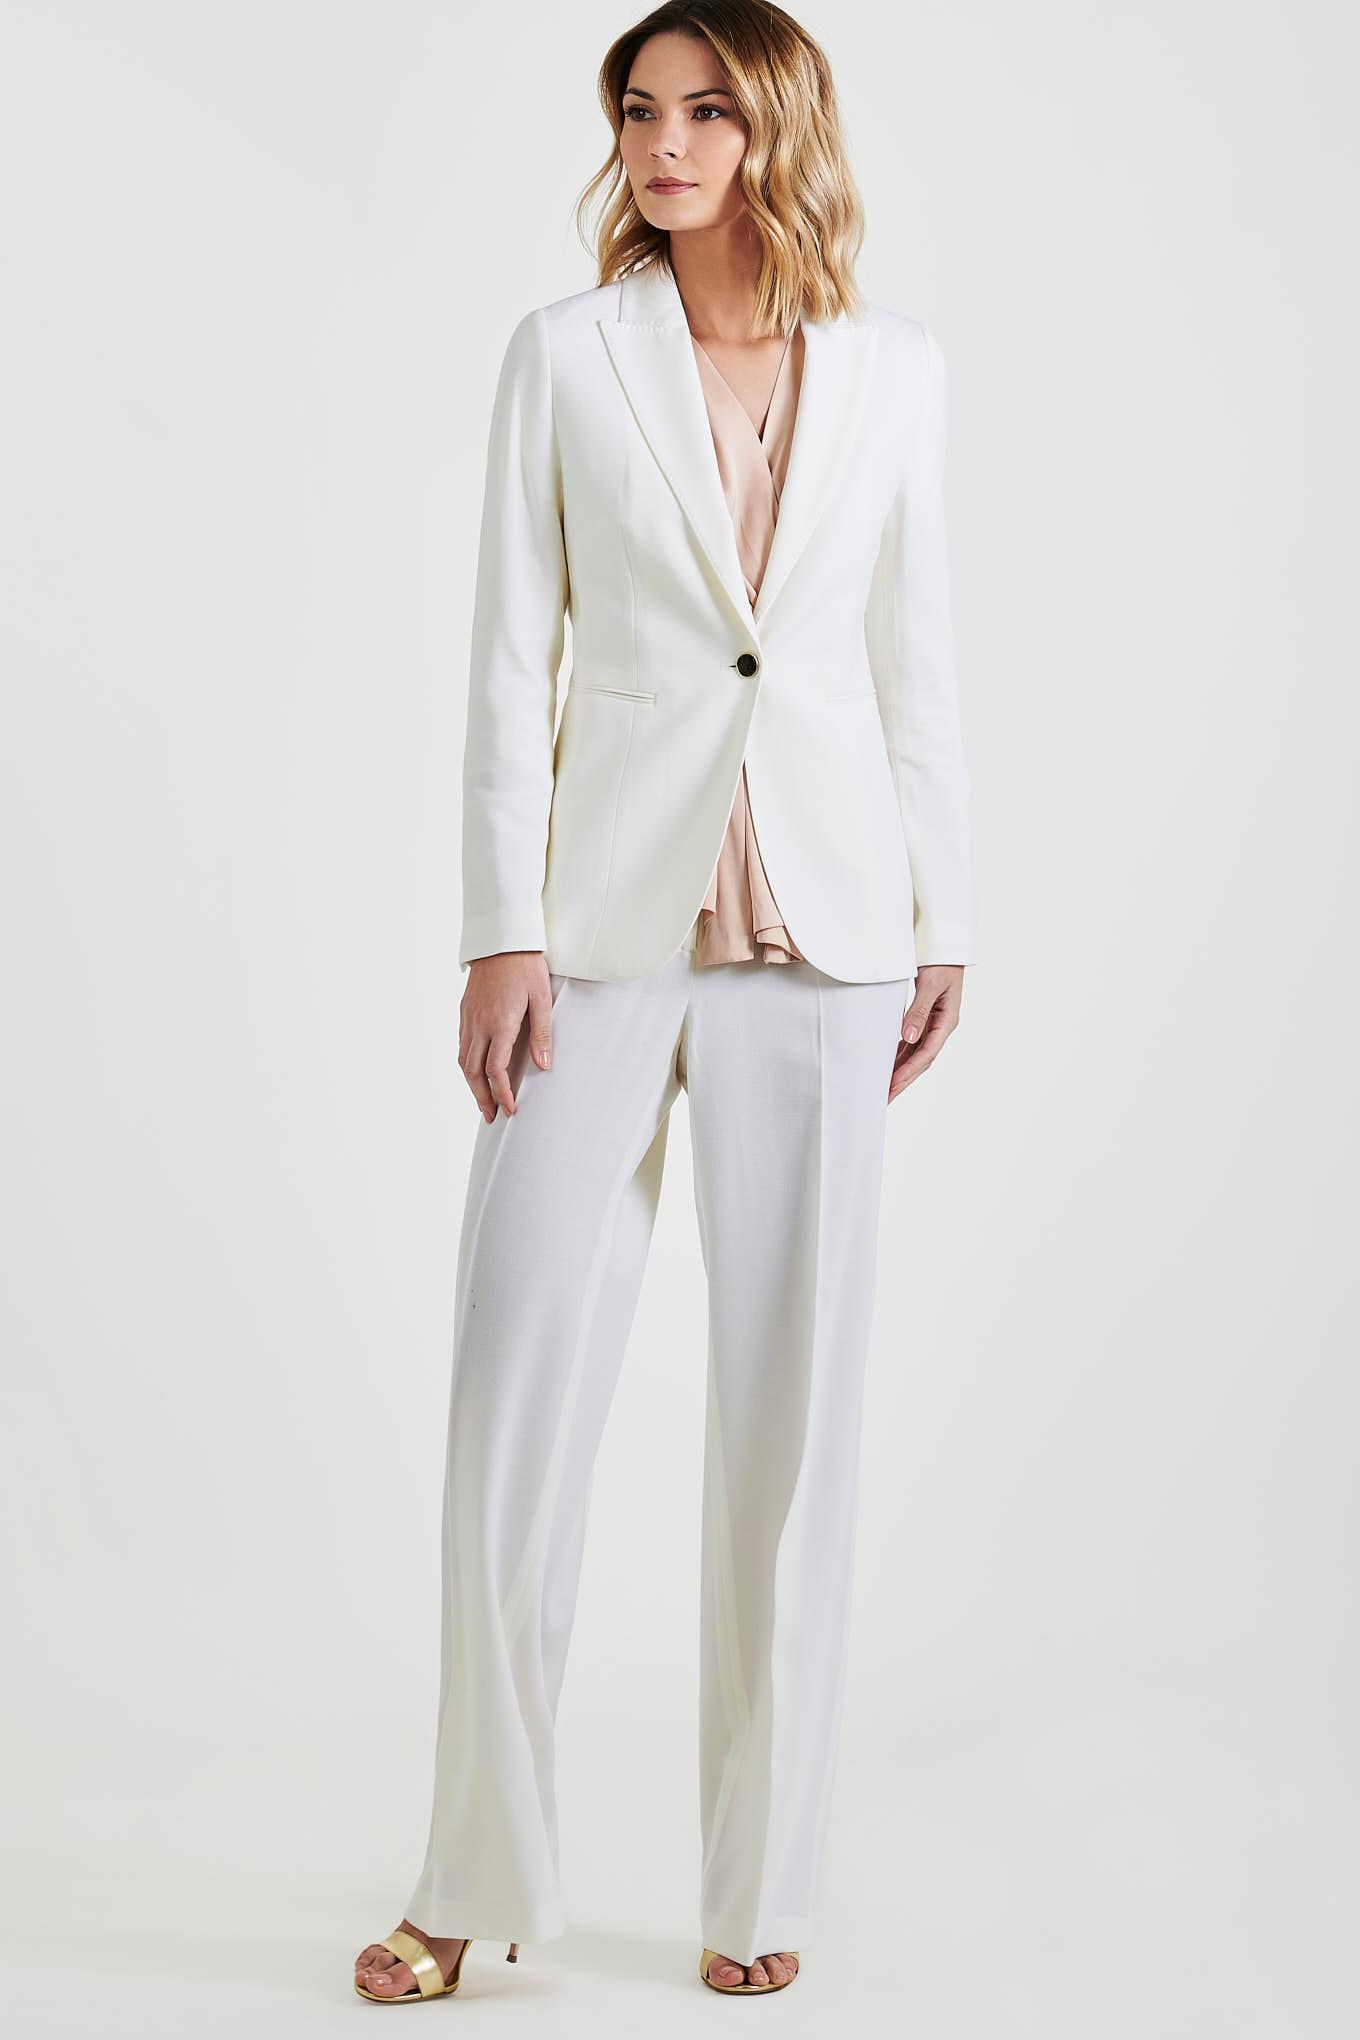 Suit Ecru Classic Woman